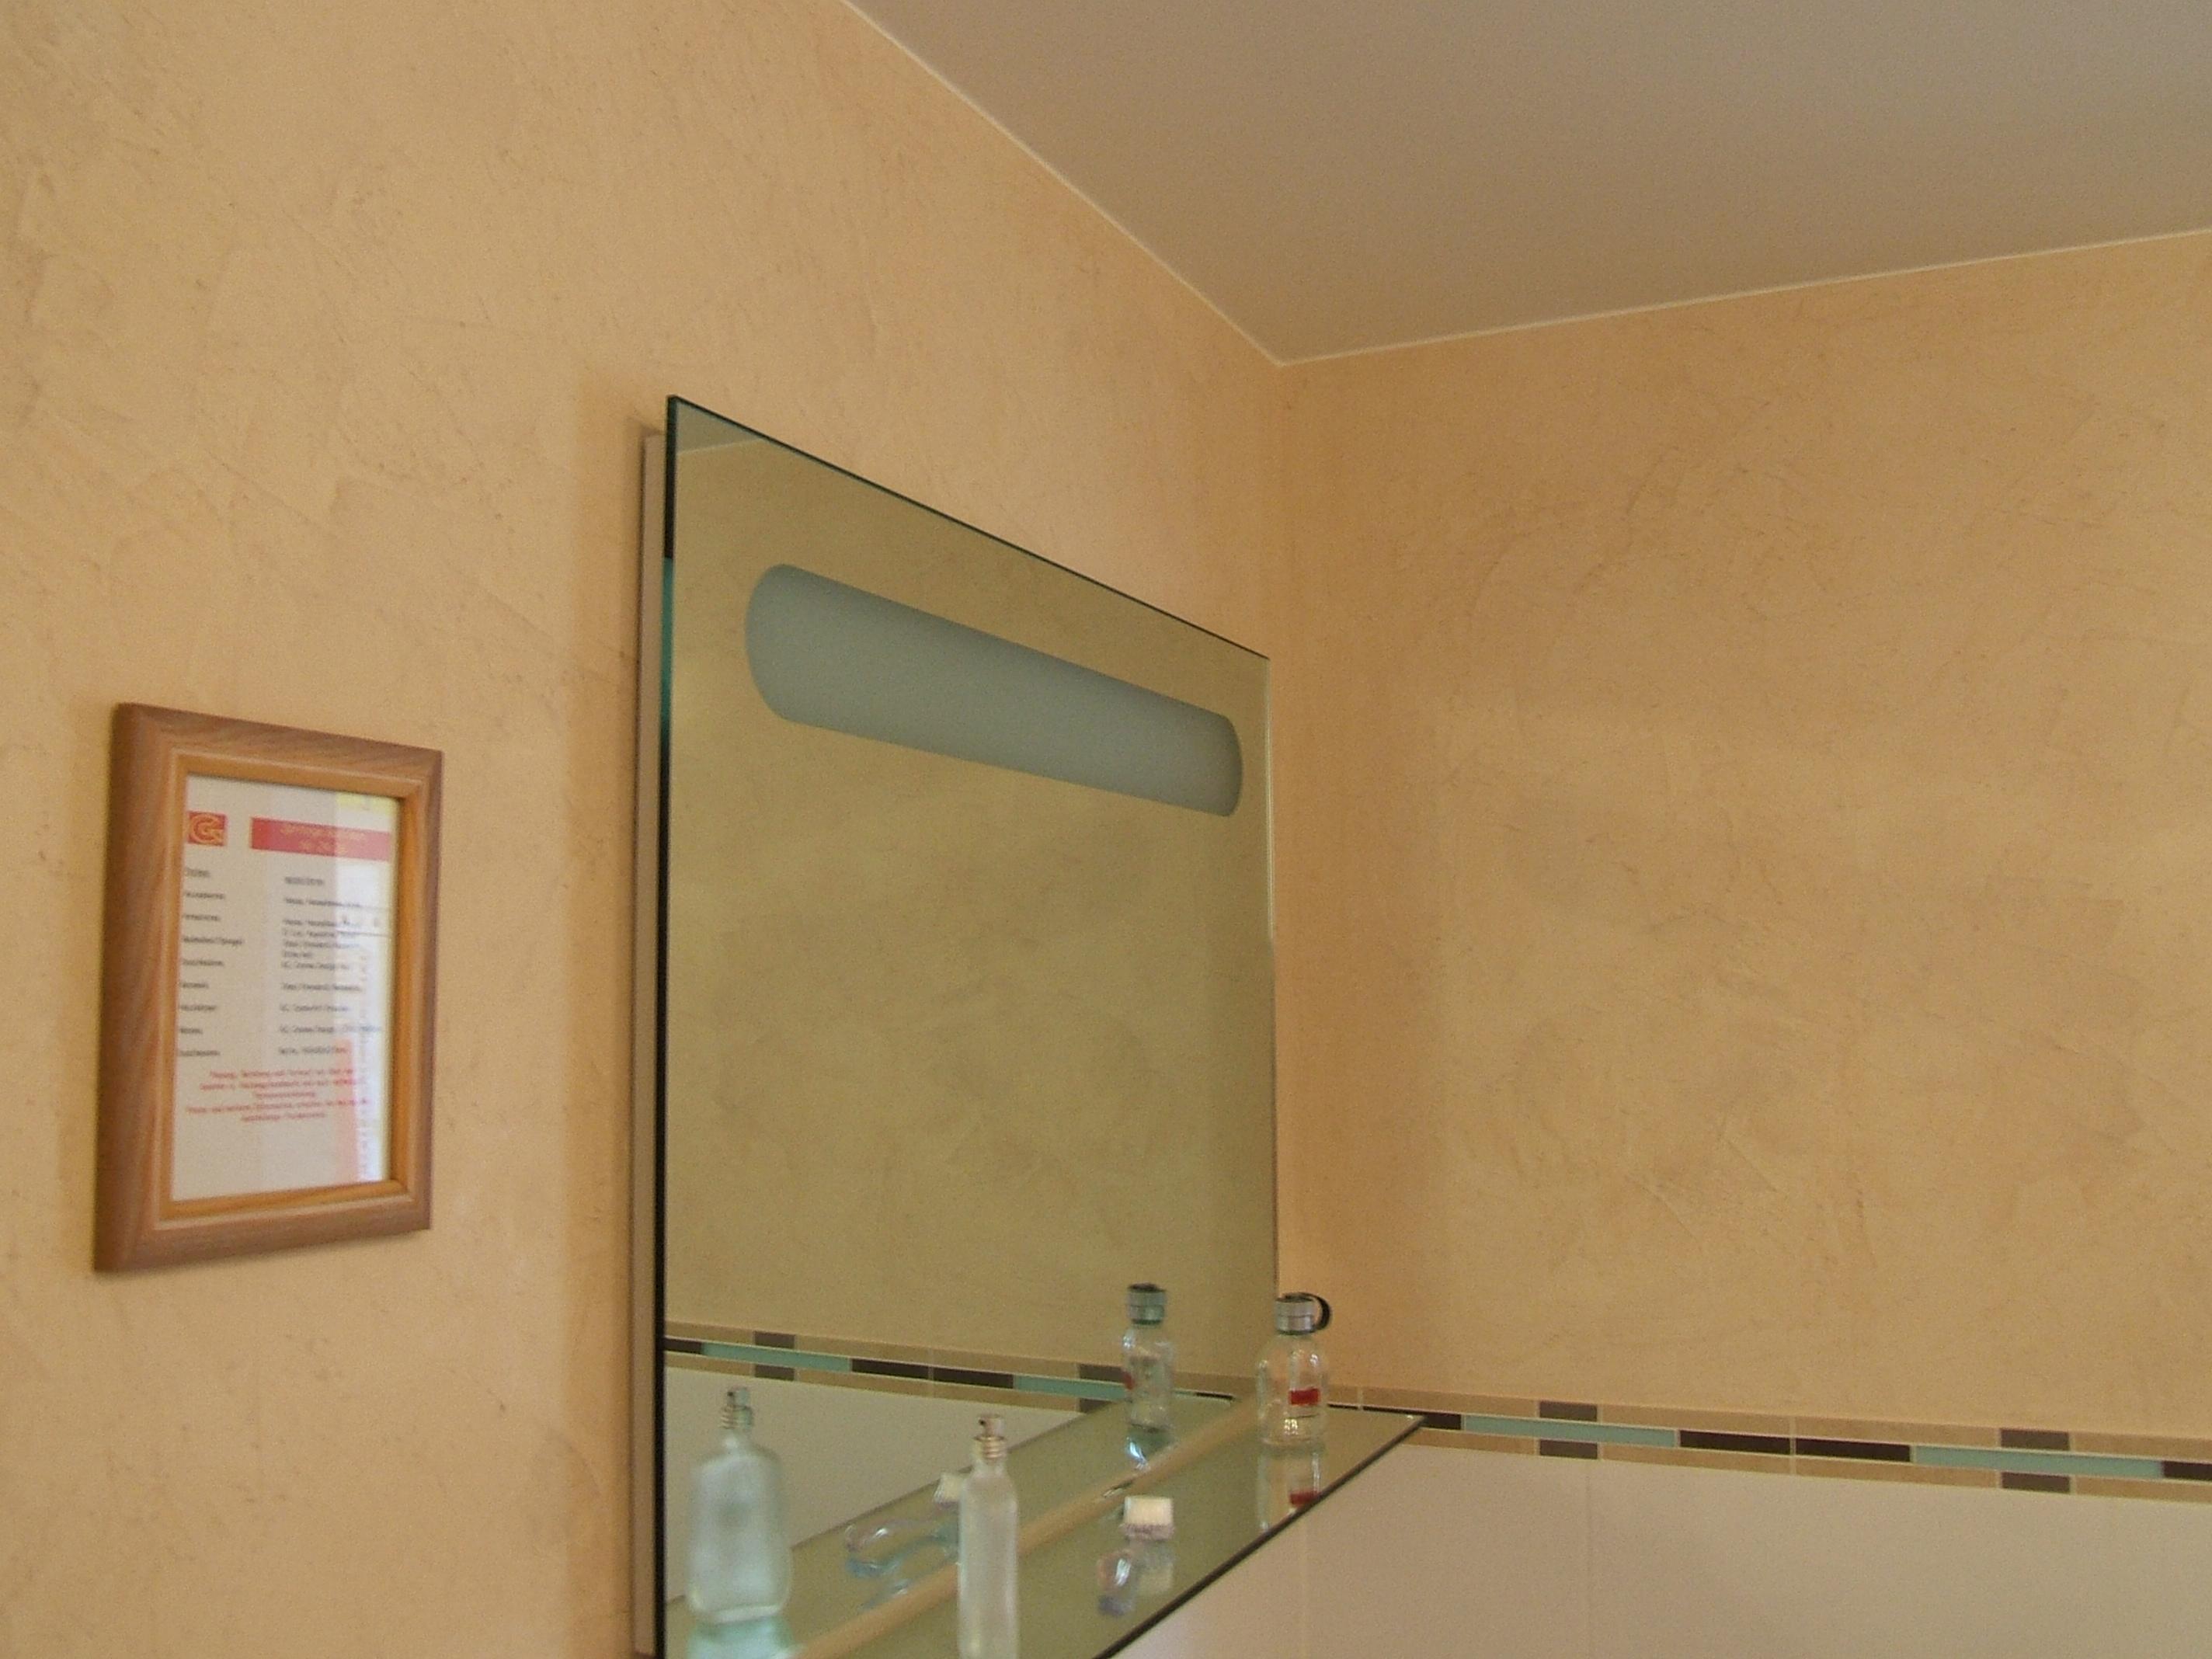 Malerbetrieb joisten habbelrath hilden marmorputz for Marmor putz im bad